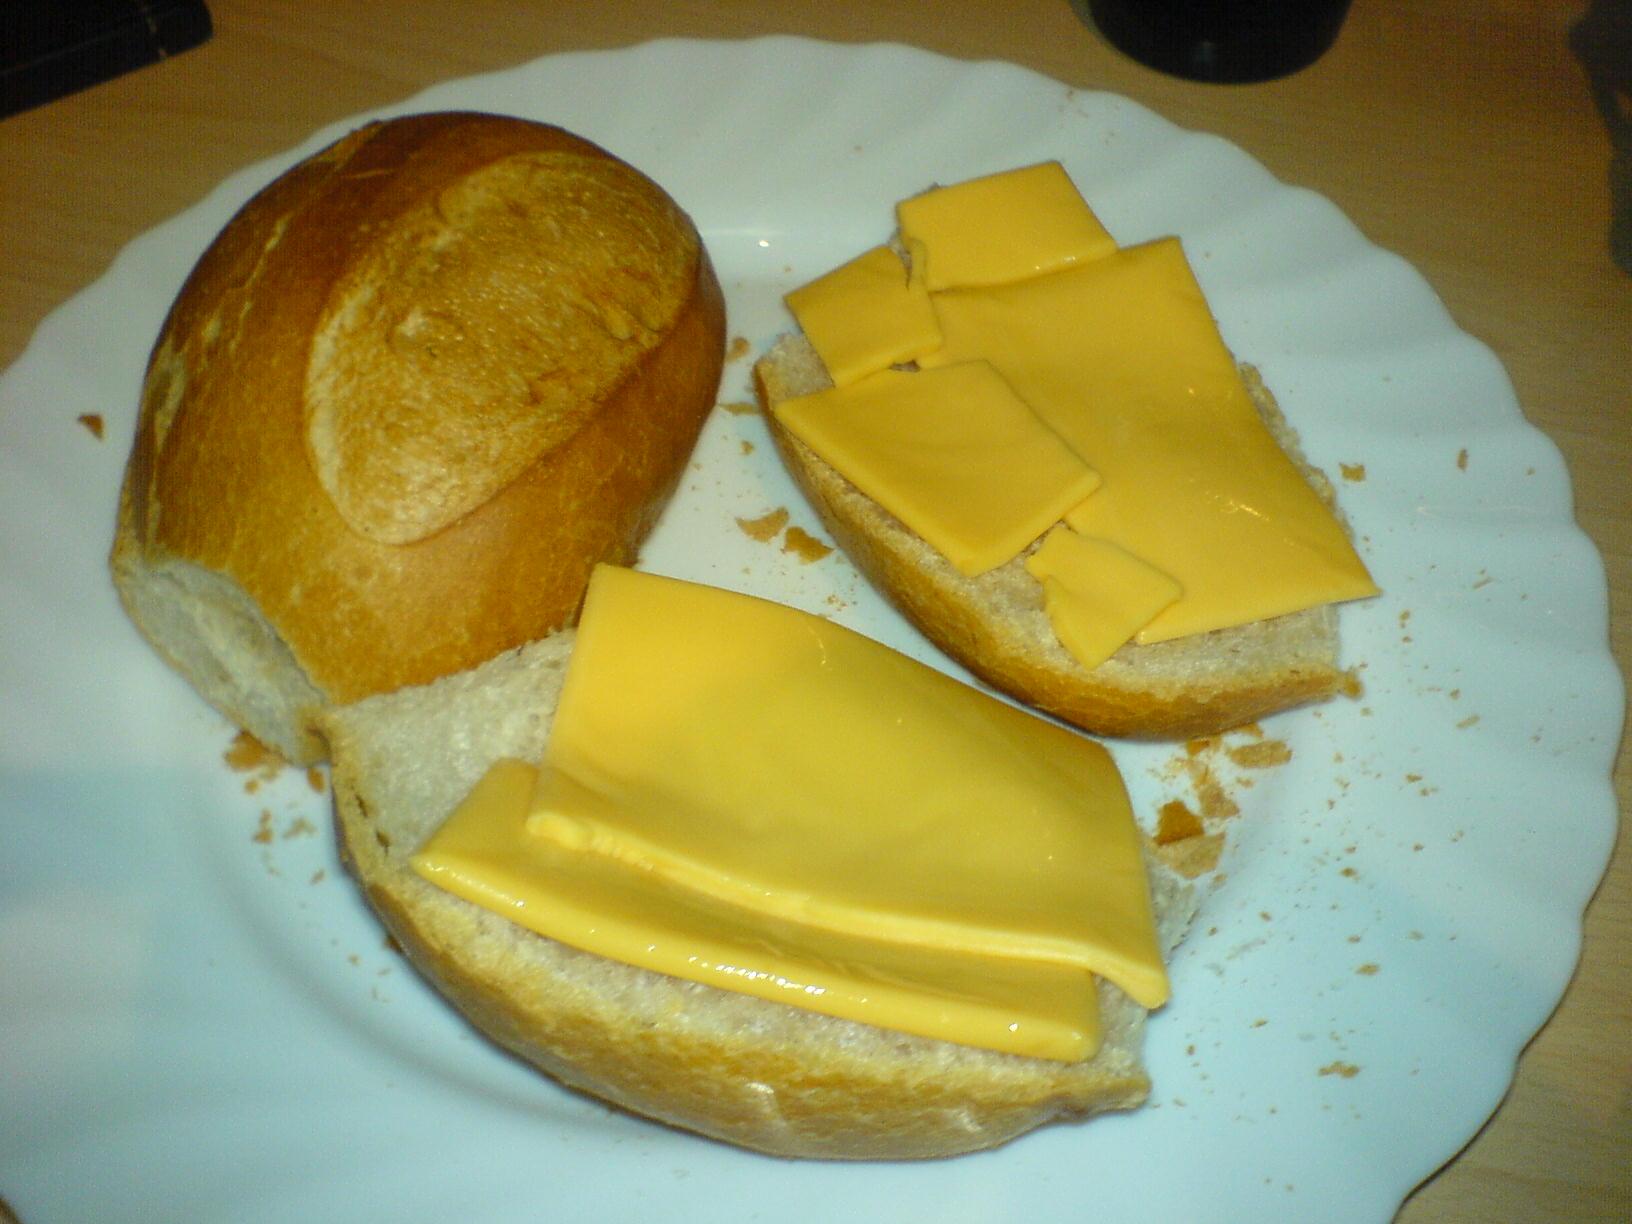 https://foodloader.net/Holz_2006-08-27_Kaesebroetchen.jpg